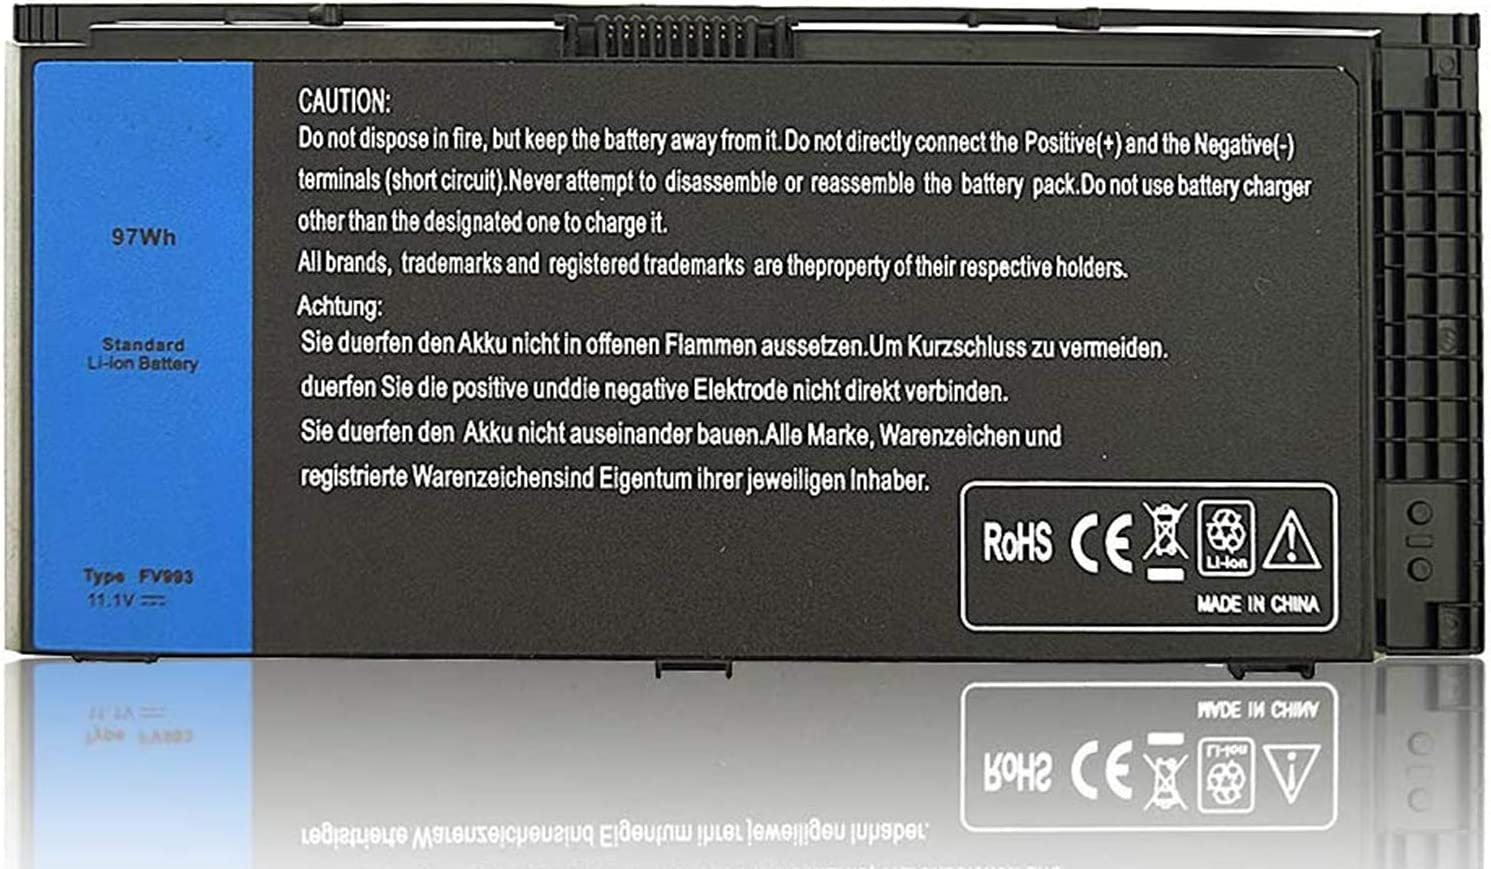 New M4800 M6800 FV993 Laptop Battery Compatible with Dell Precision M4600 M4700 M6700 M6600 Series,Fits FJJ4W KJ321 PG6RC V7M28 R7PND Laptop 11.1V 97Wh